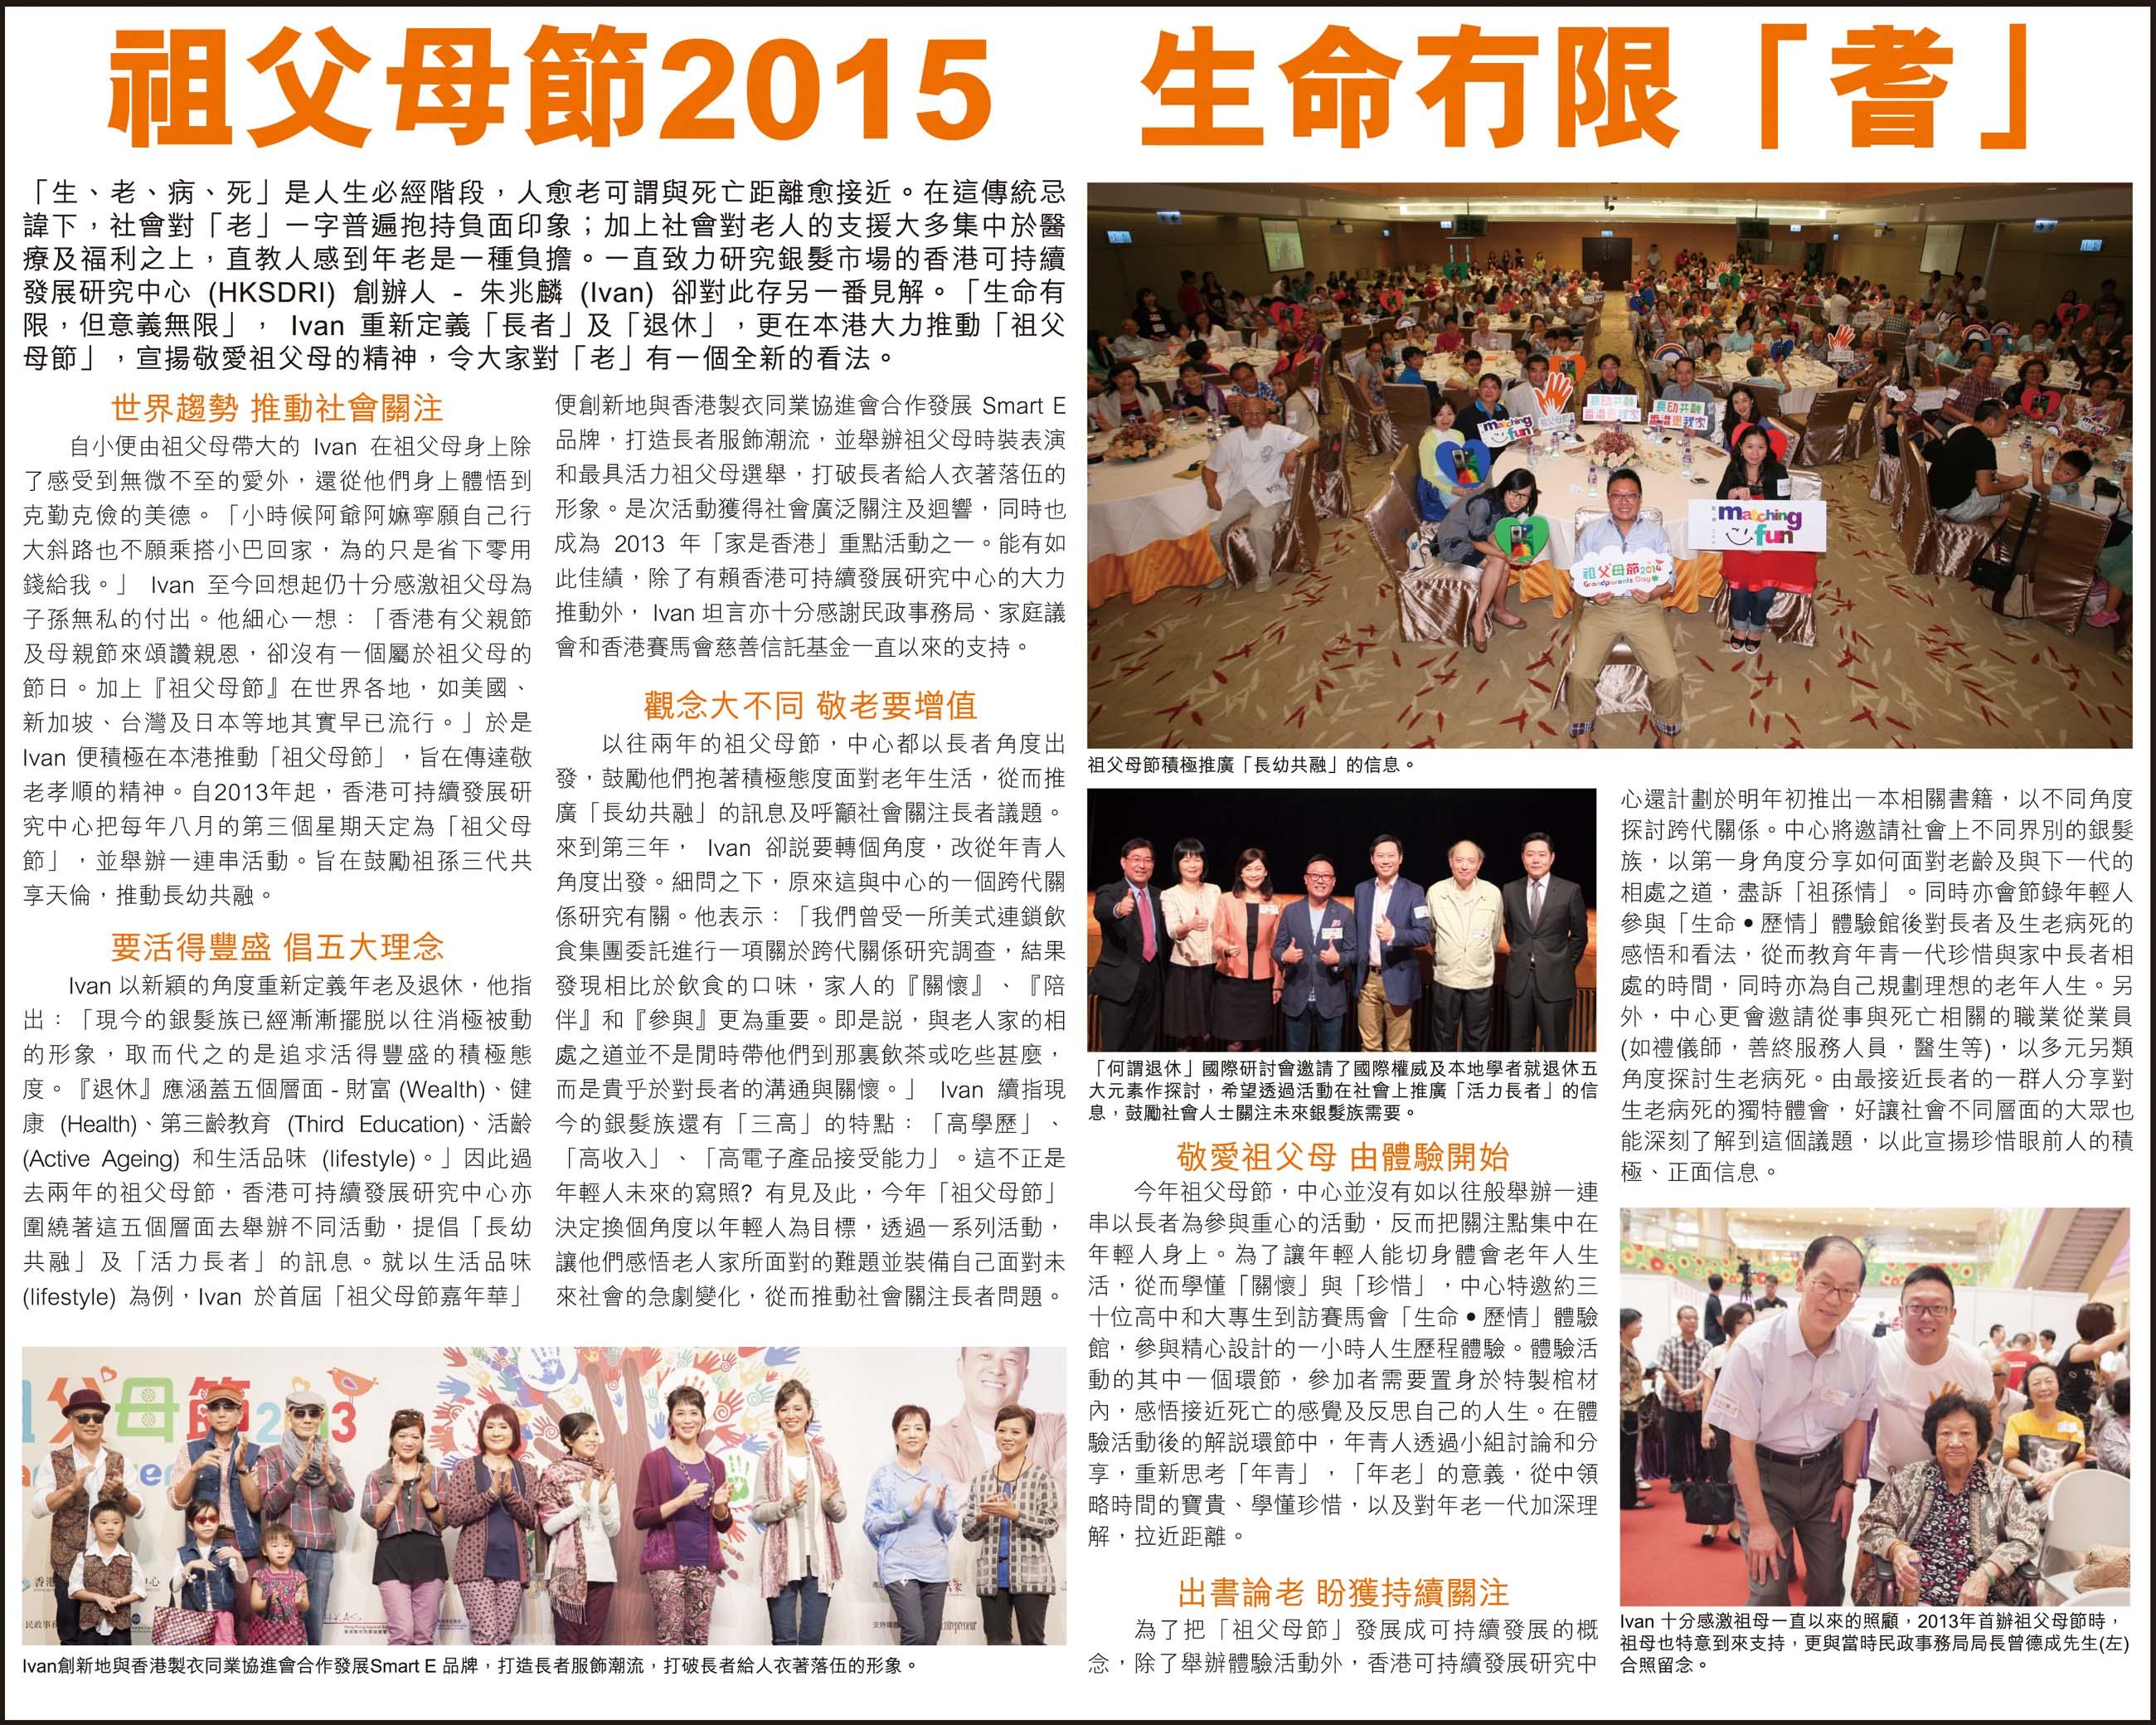 20151028_Singtao_Grandparents Day 2015(1)